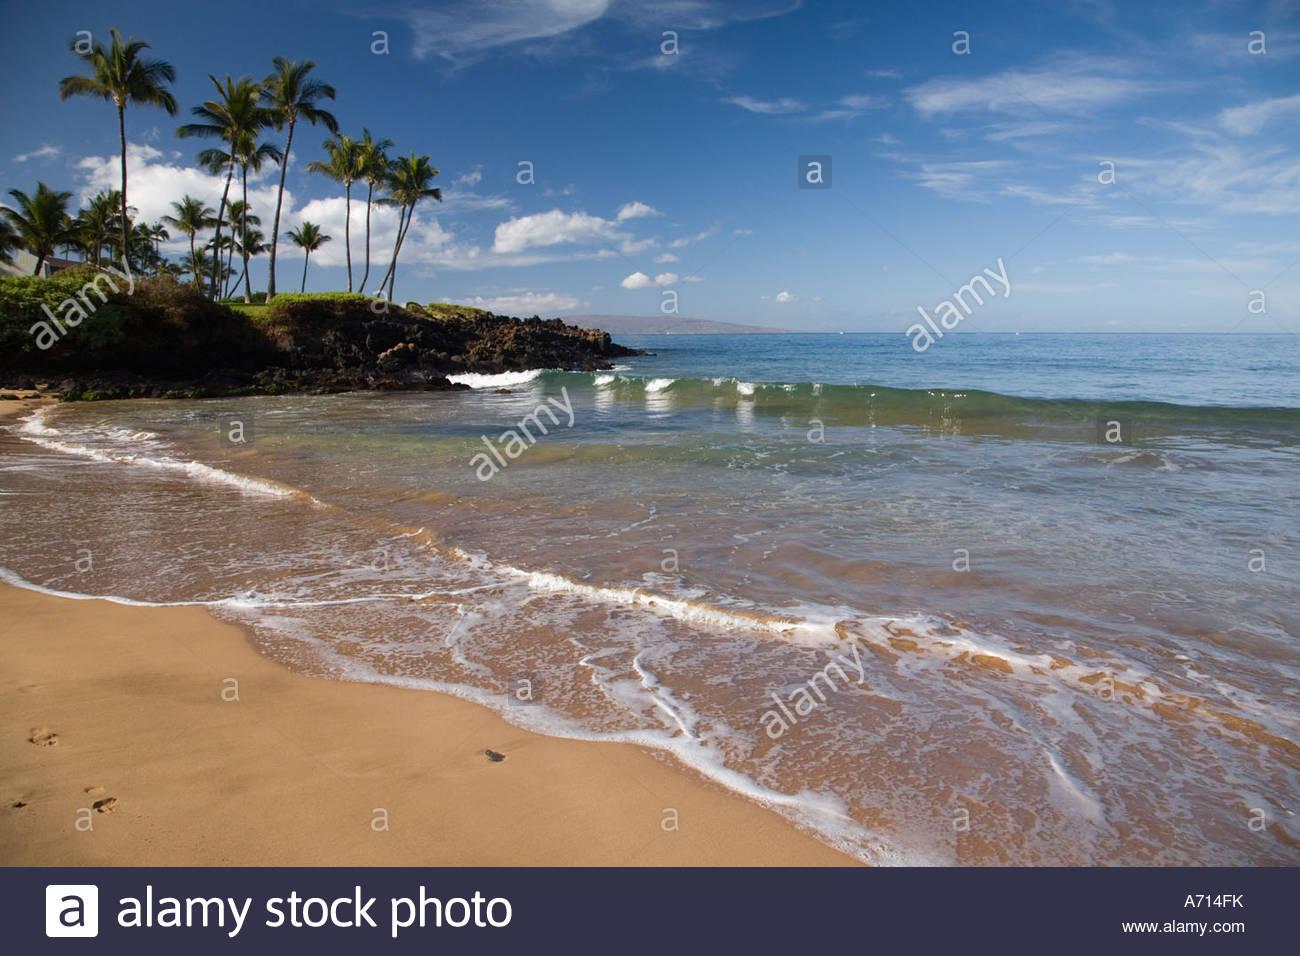 Ulua Beach at Wailea on the island of Maui in the State of Hawaii USA Stock Photo